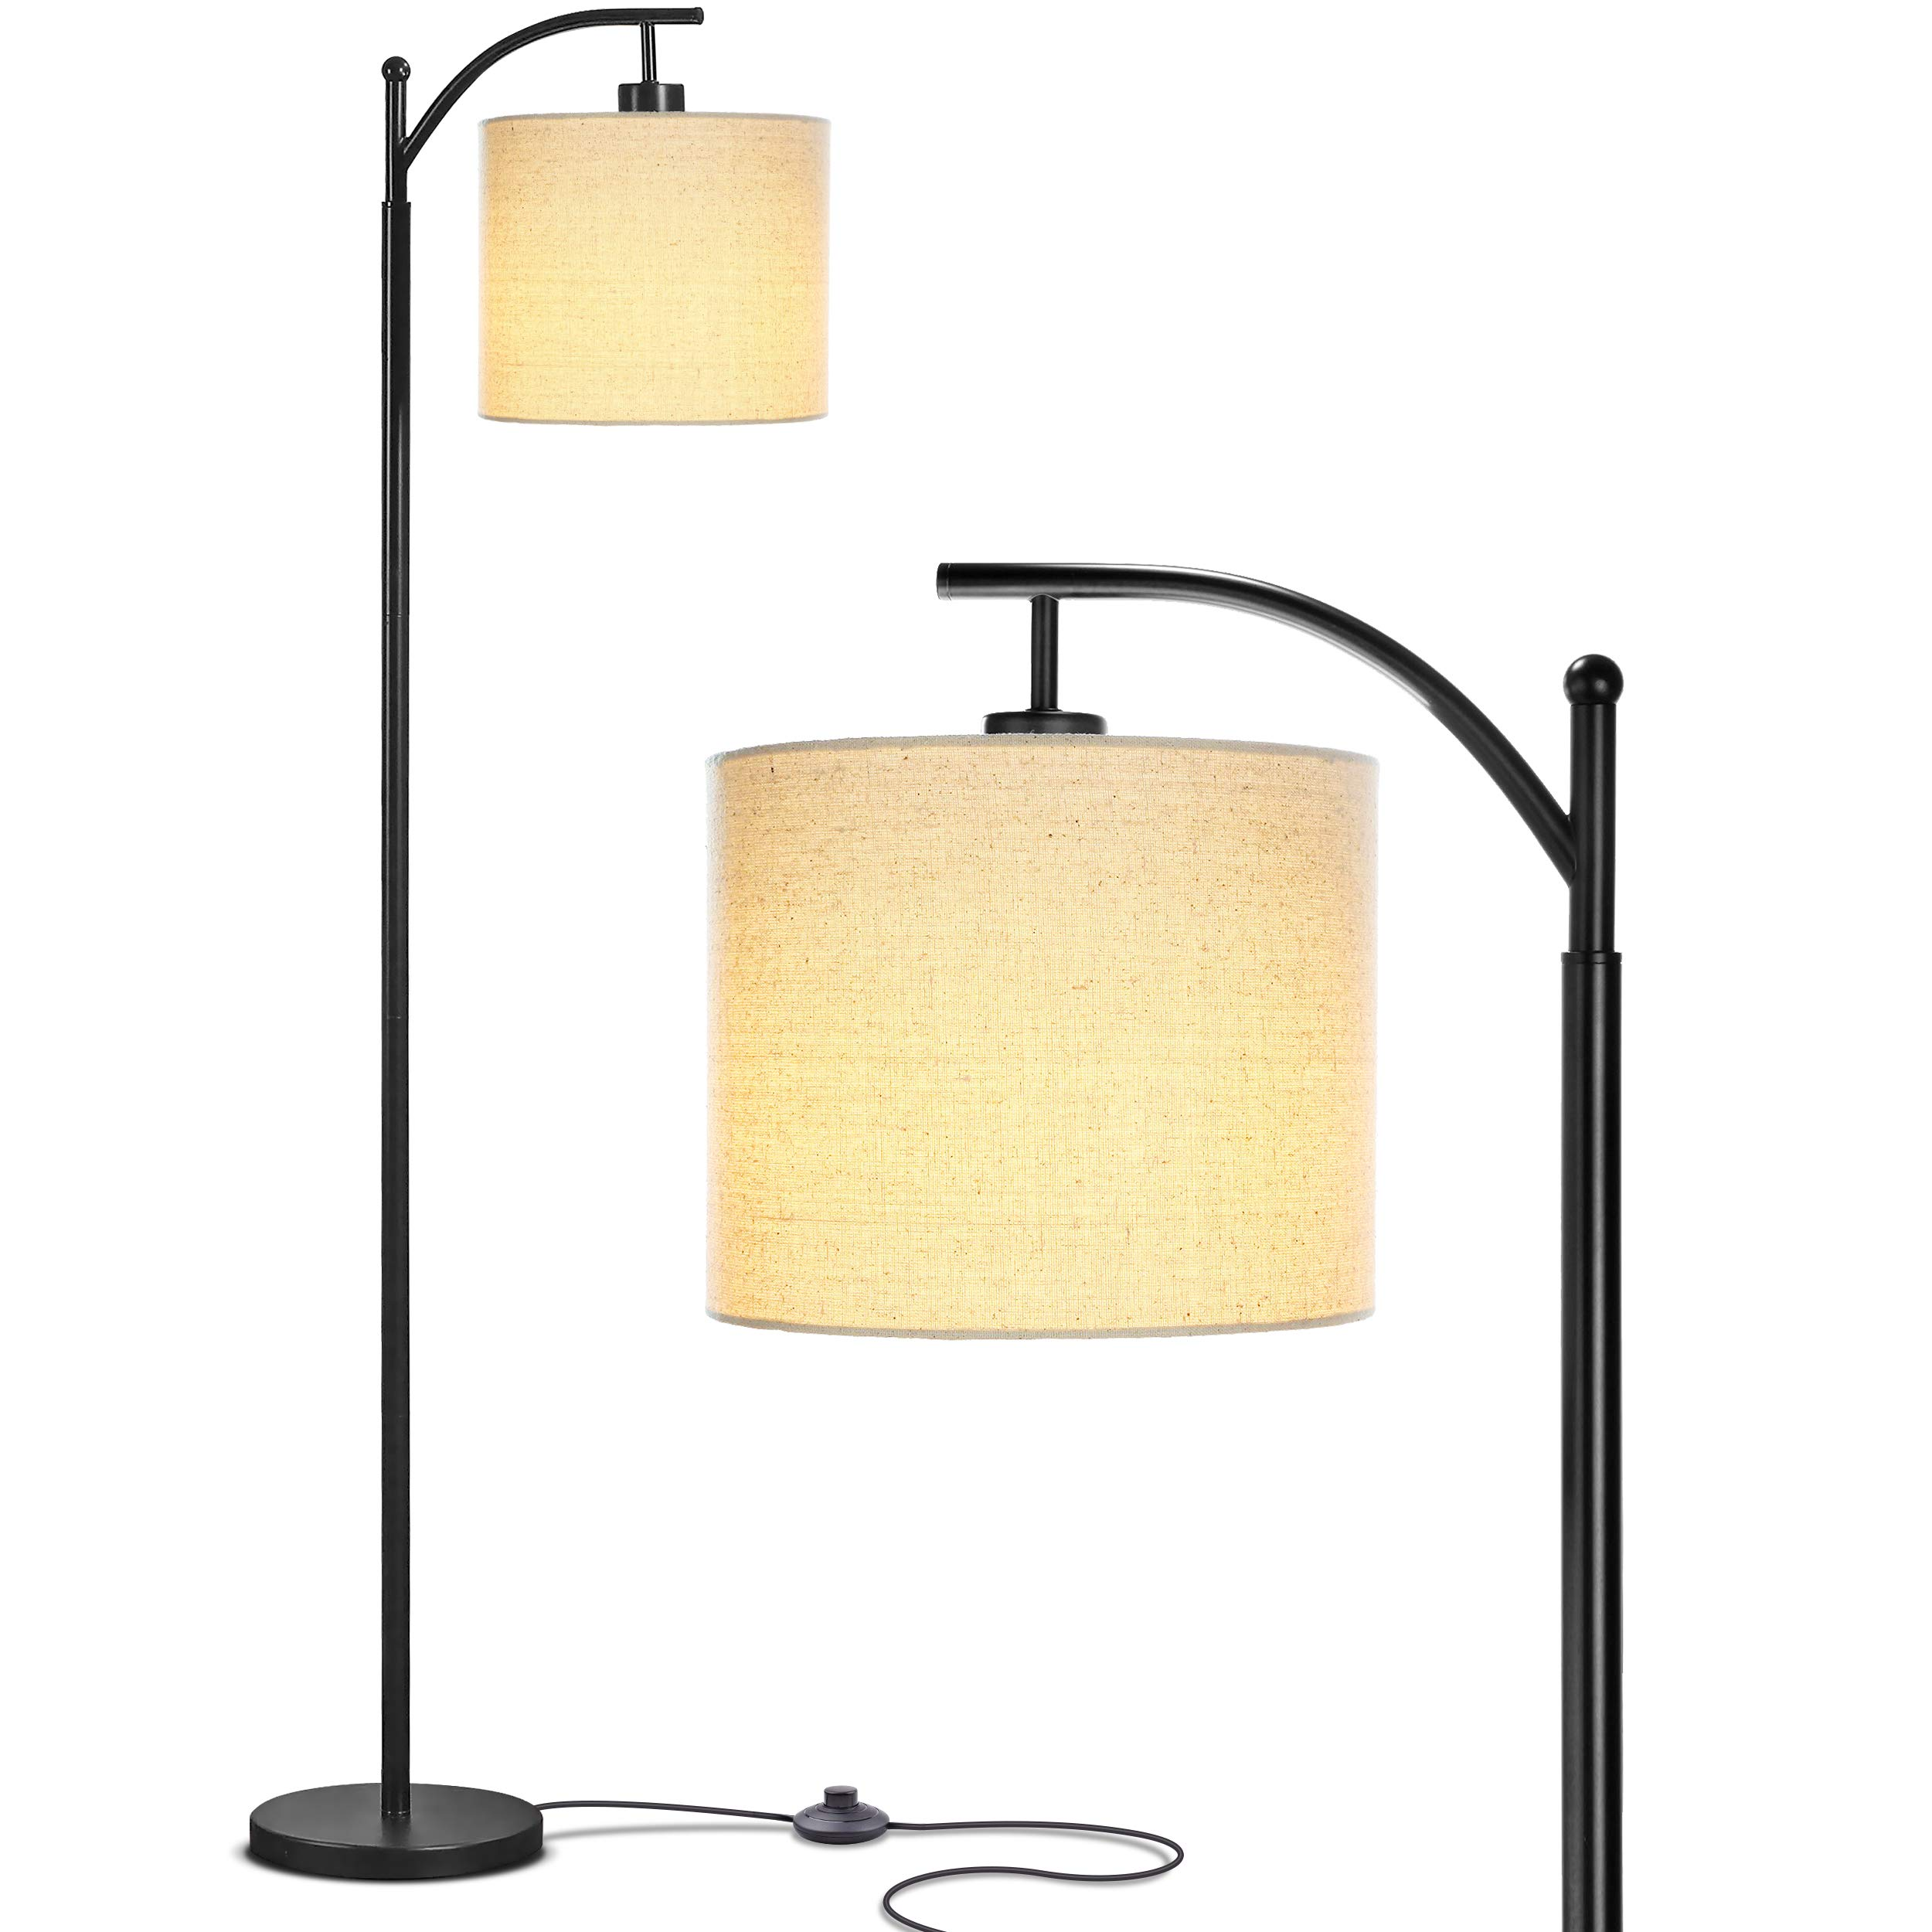 Chandeliers Charitable Modern Retro Track Lights Loft Industrial Living Room Bar Shop Led Long Pole Spotlight Decorative Design Cafe Bar Hanging Lamps More Discounts Surprises